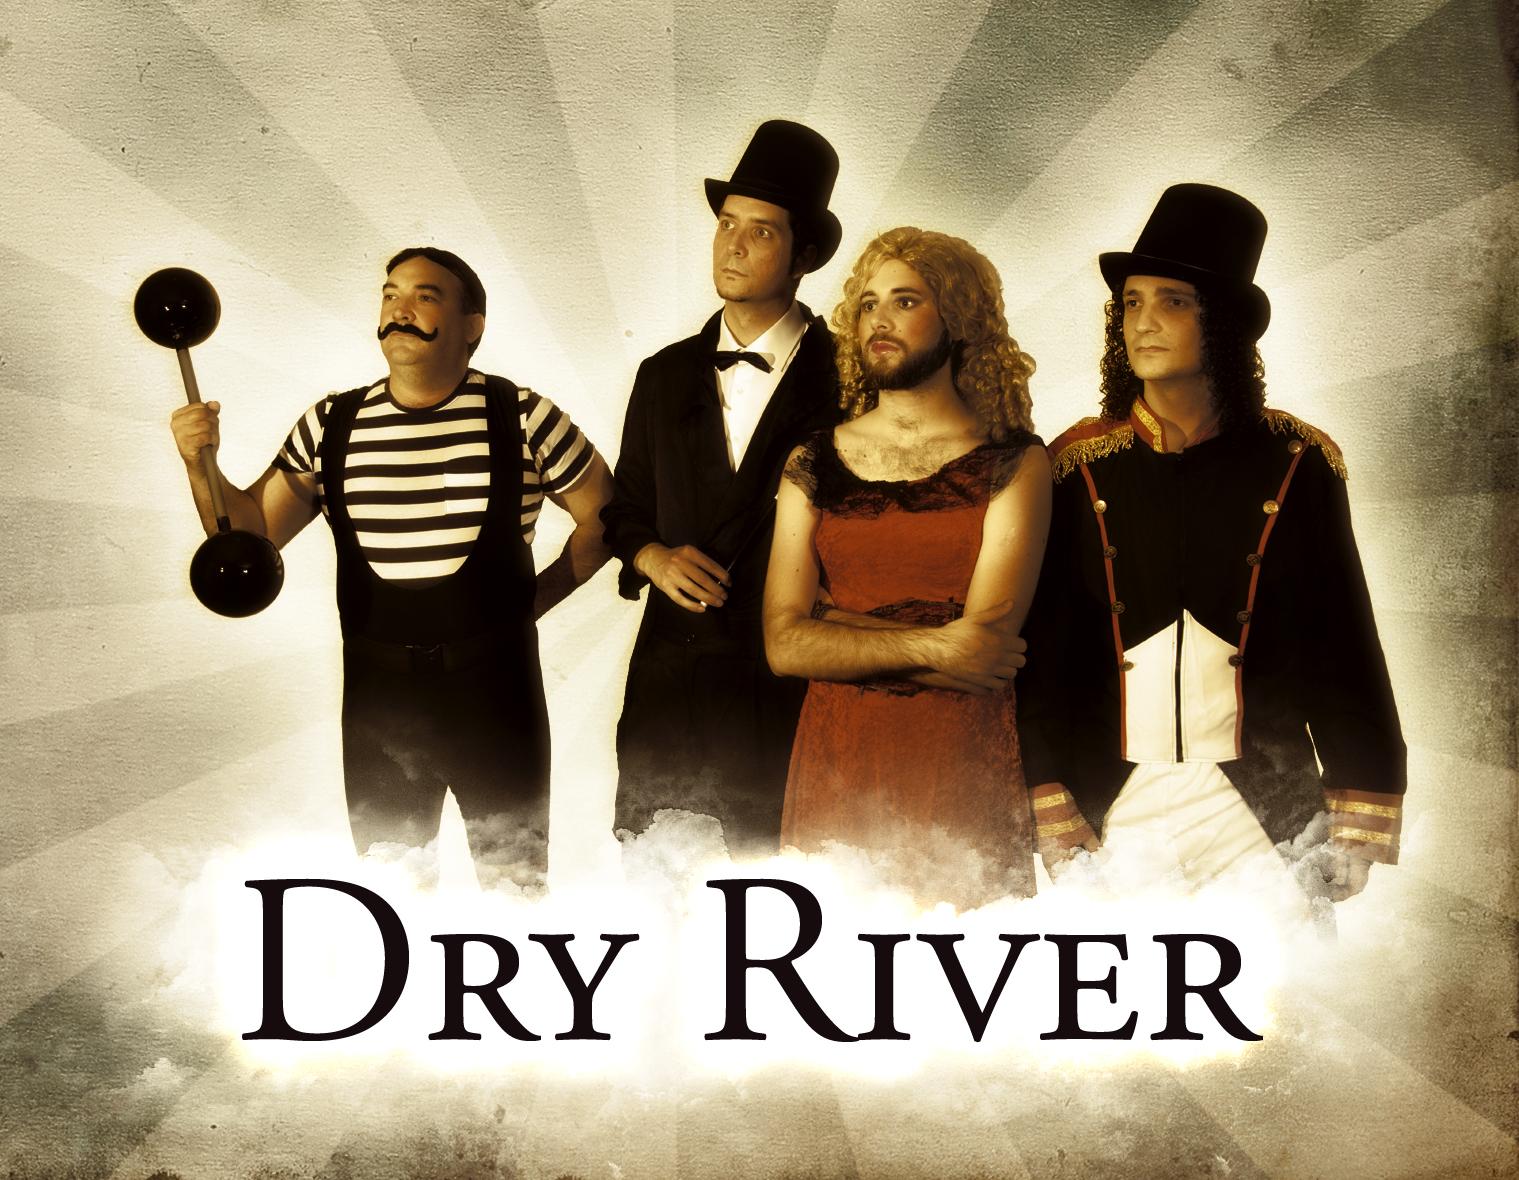 DRY RIVER. Imagen promocional. Foto: Archivo